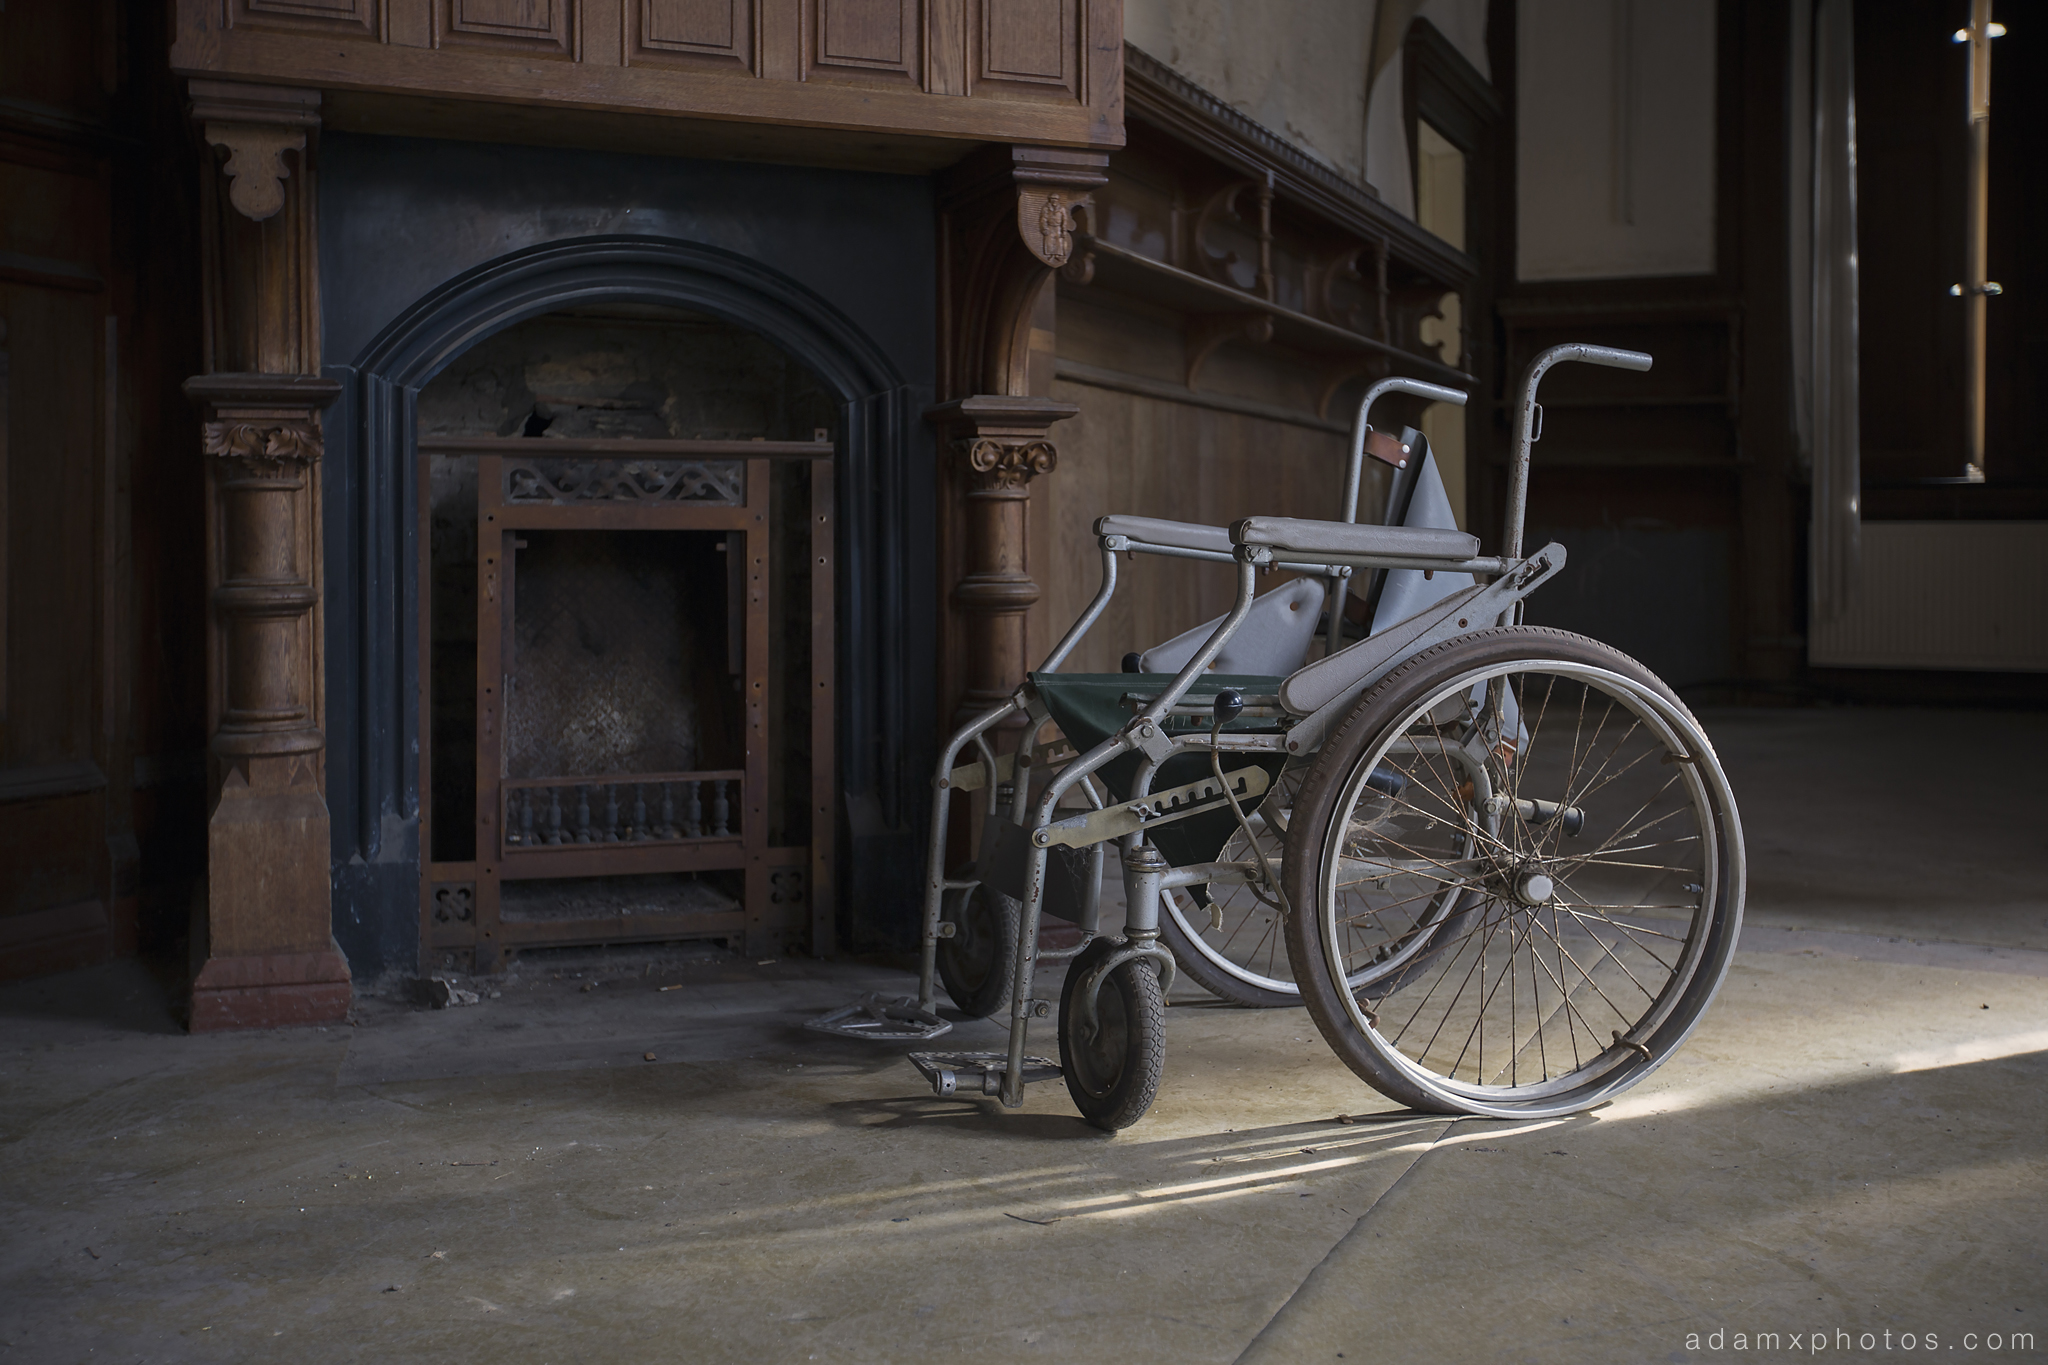 Adam X Urbex Krankenhaus von rollstuhlen Hospital of wheelchairs Germany Urban Exploration Decay Lost Abandoned Hidden Wheelchair fireplace